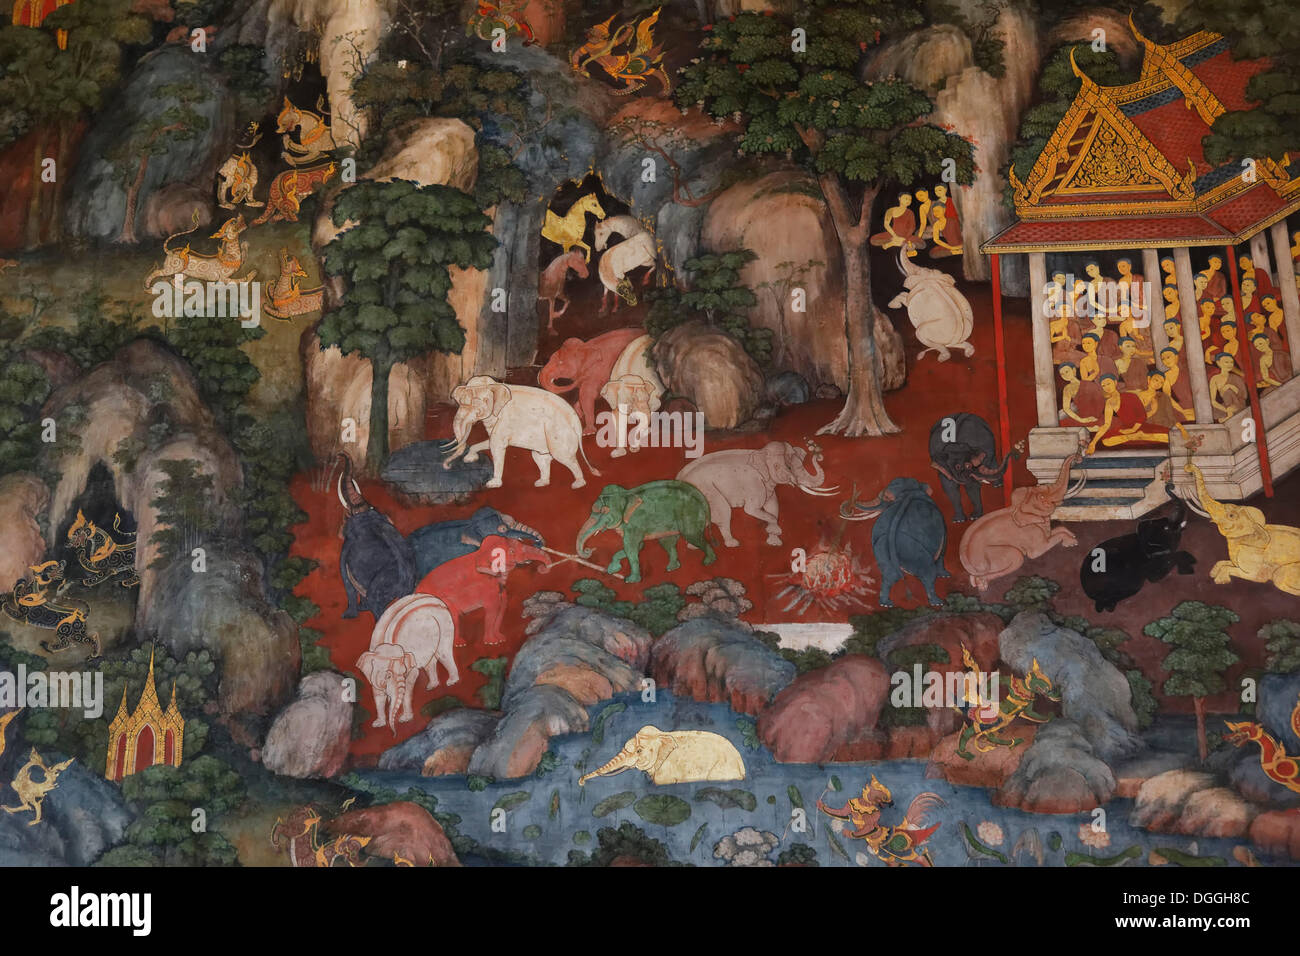 Himaphan wall painting in the Ubosot or ordinary hall of Wat Suthat Temple, Zentralthailand, Bangkok, Bangkok, Thailand - Stock Image